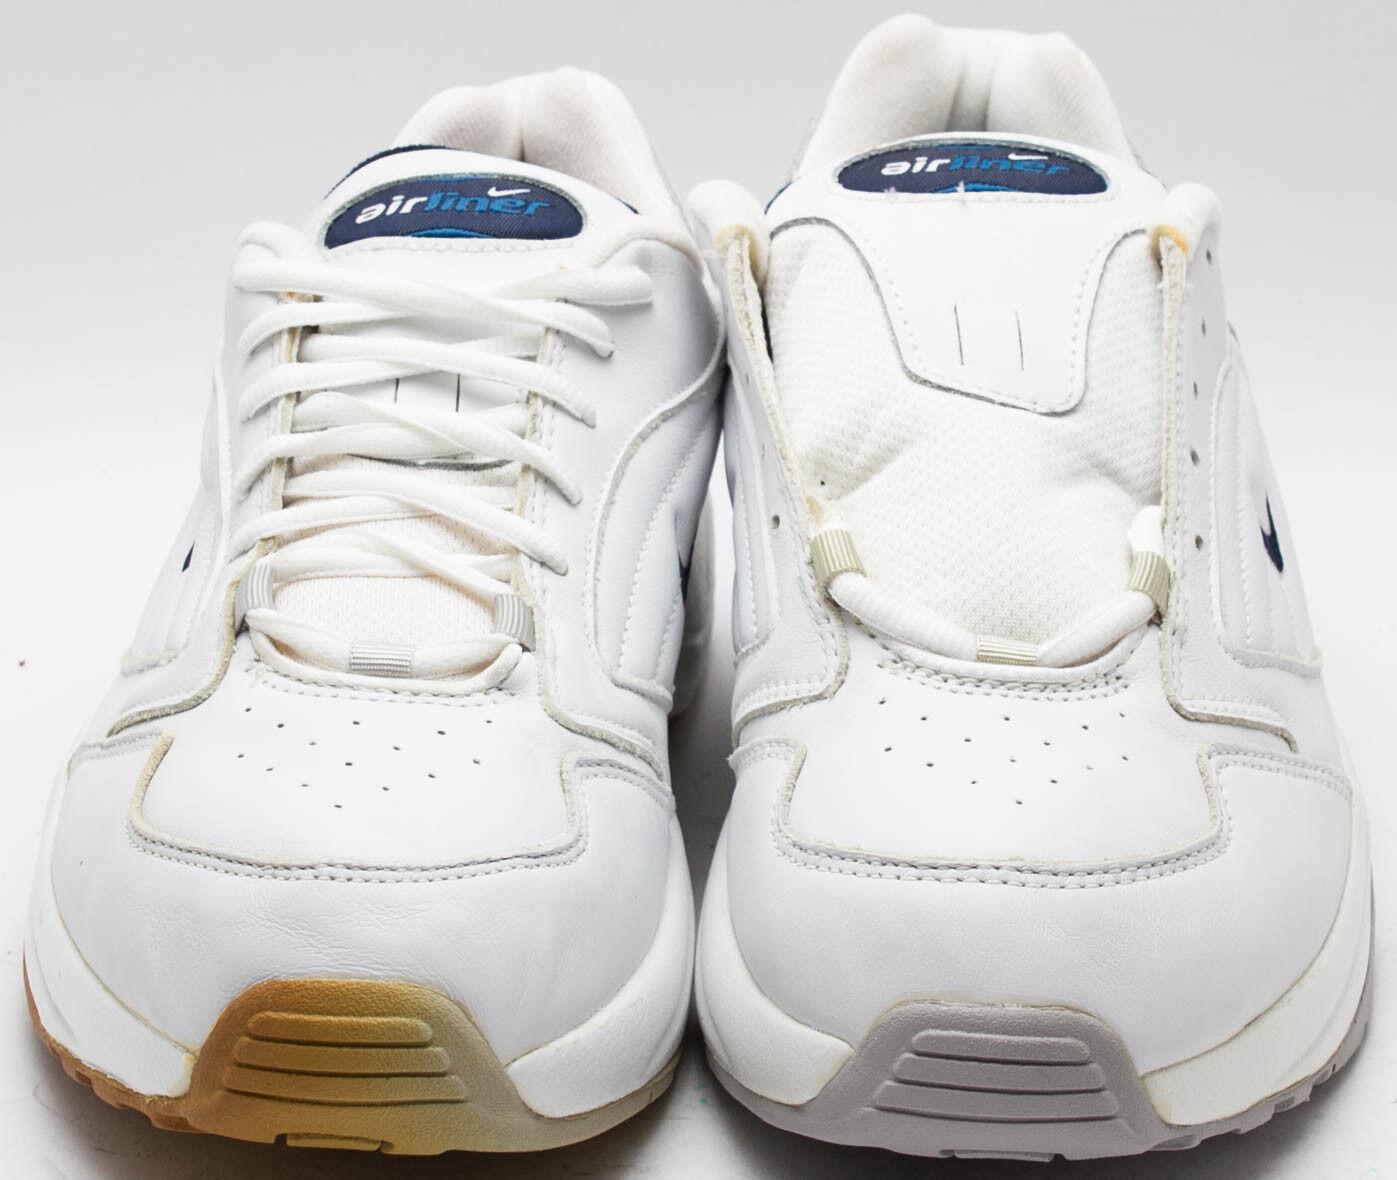 Nike Damen Vintage 1999 Cross niedrig Trainer A. S.3 niedrig Cross 173175-141 weiß Größe 8.5 e946ec